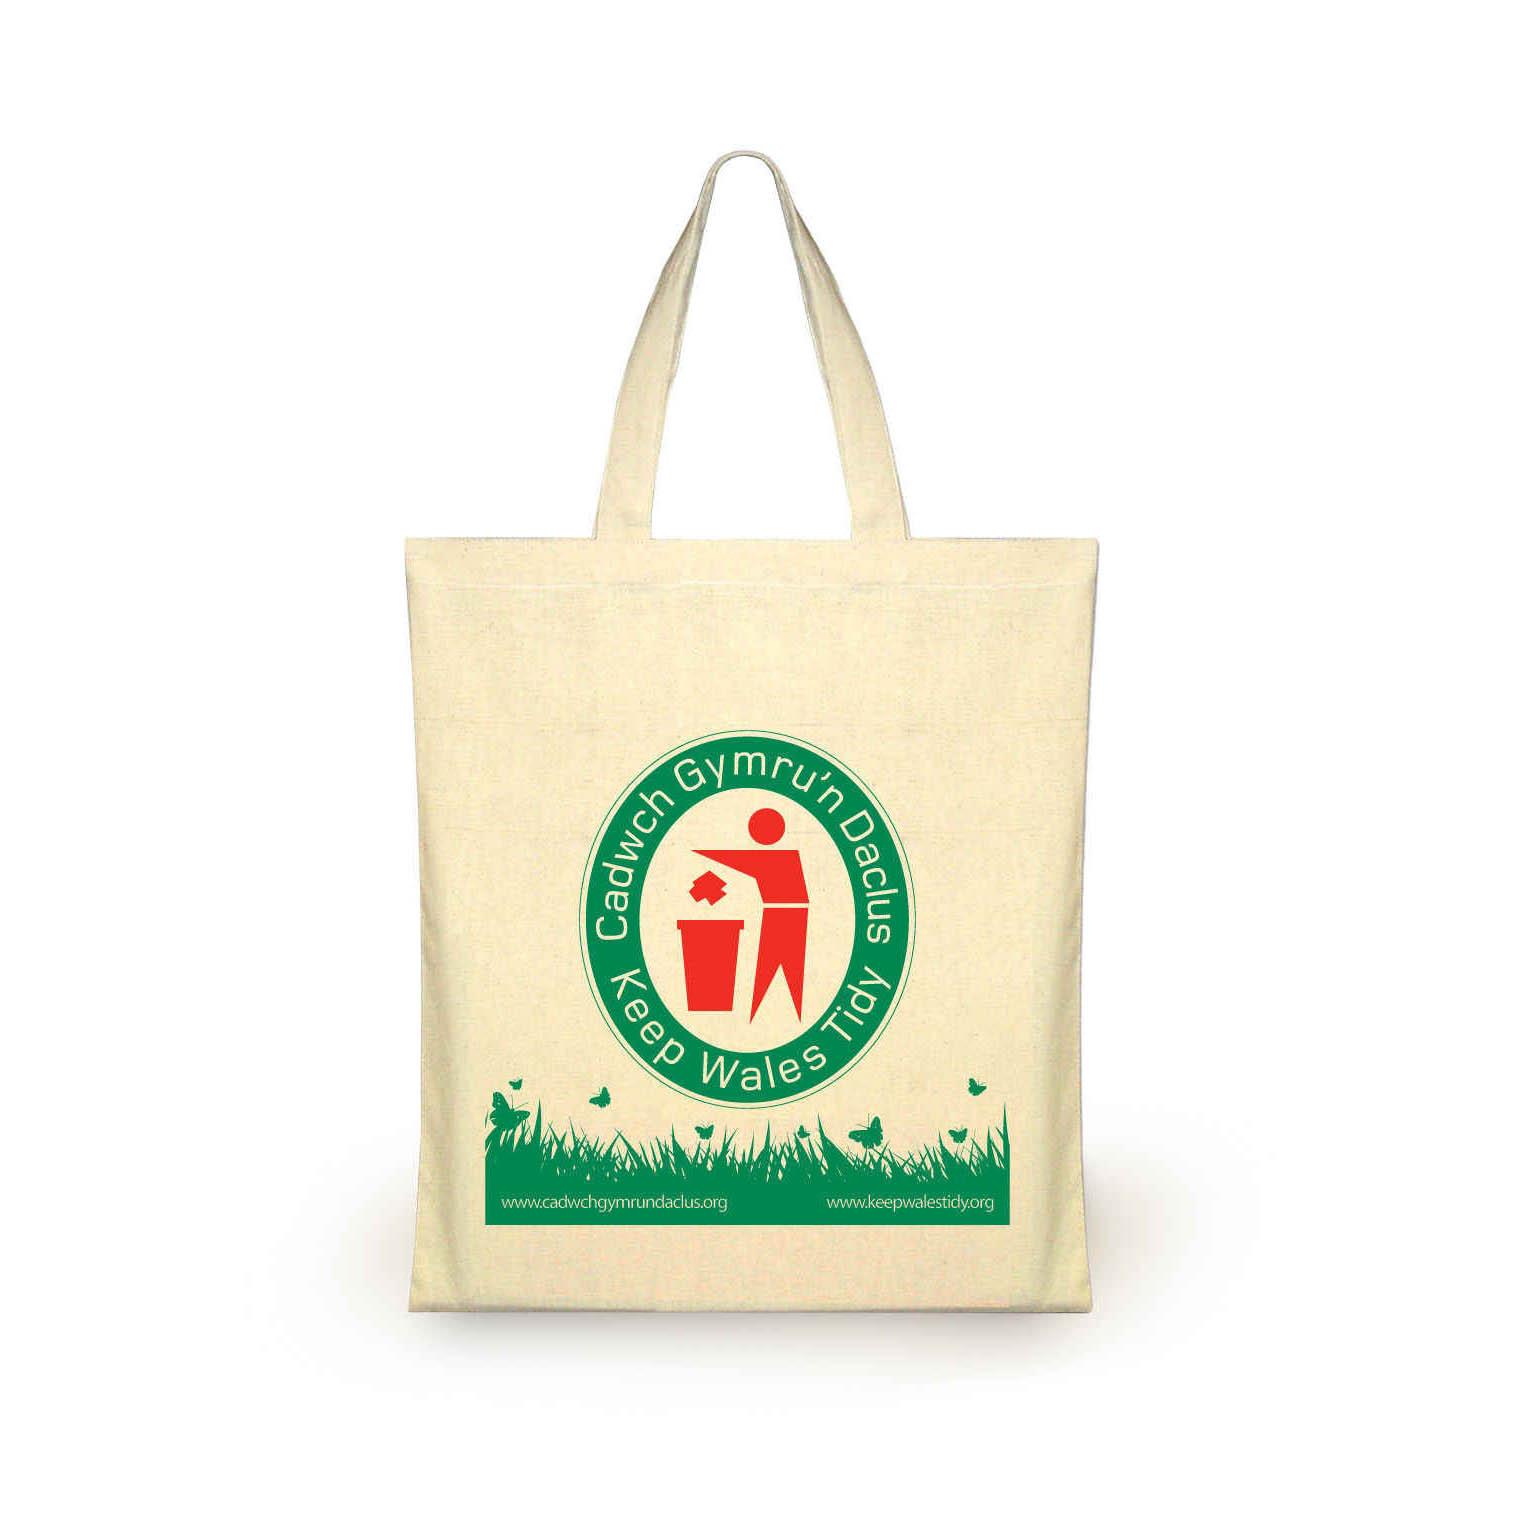 Custom Printed Cotton Shopping Bags